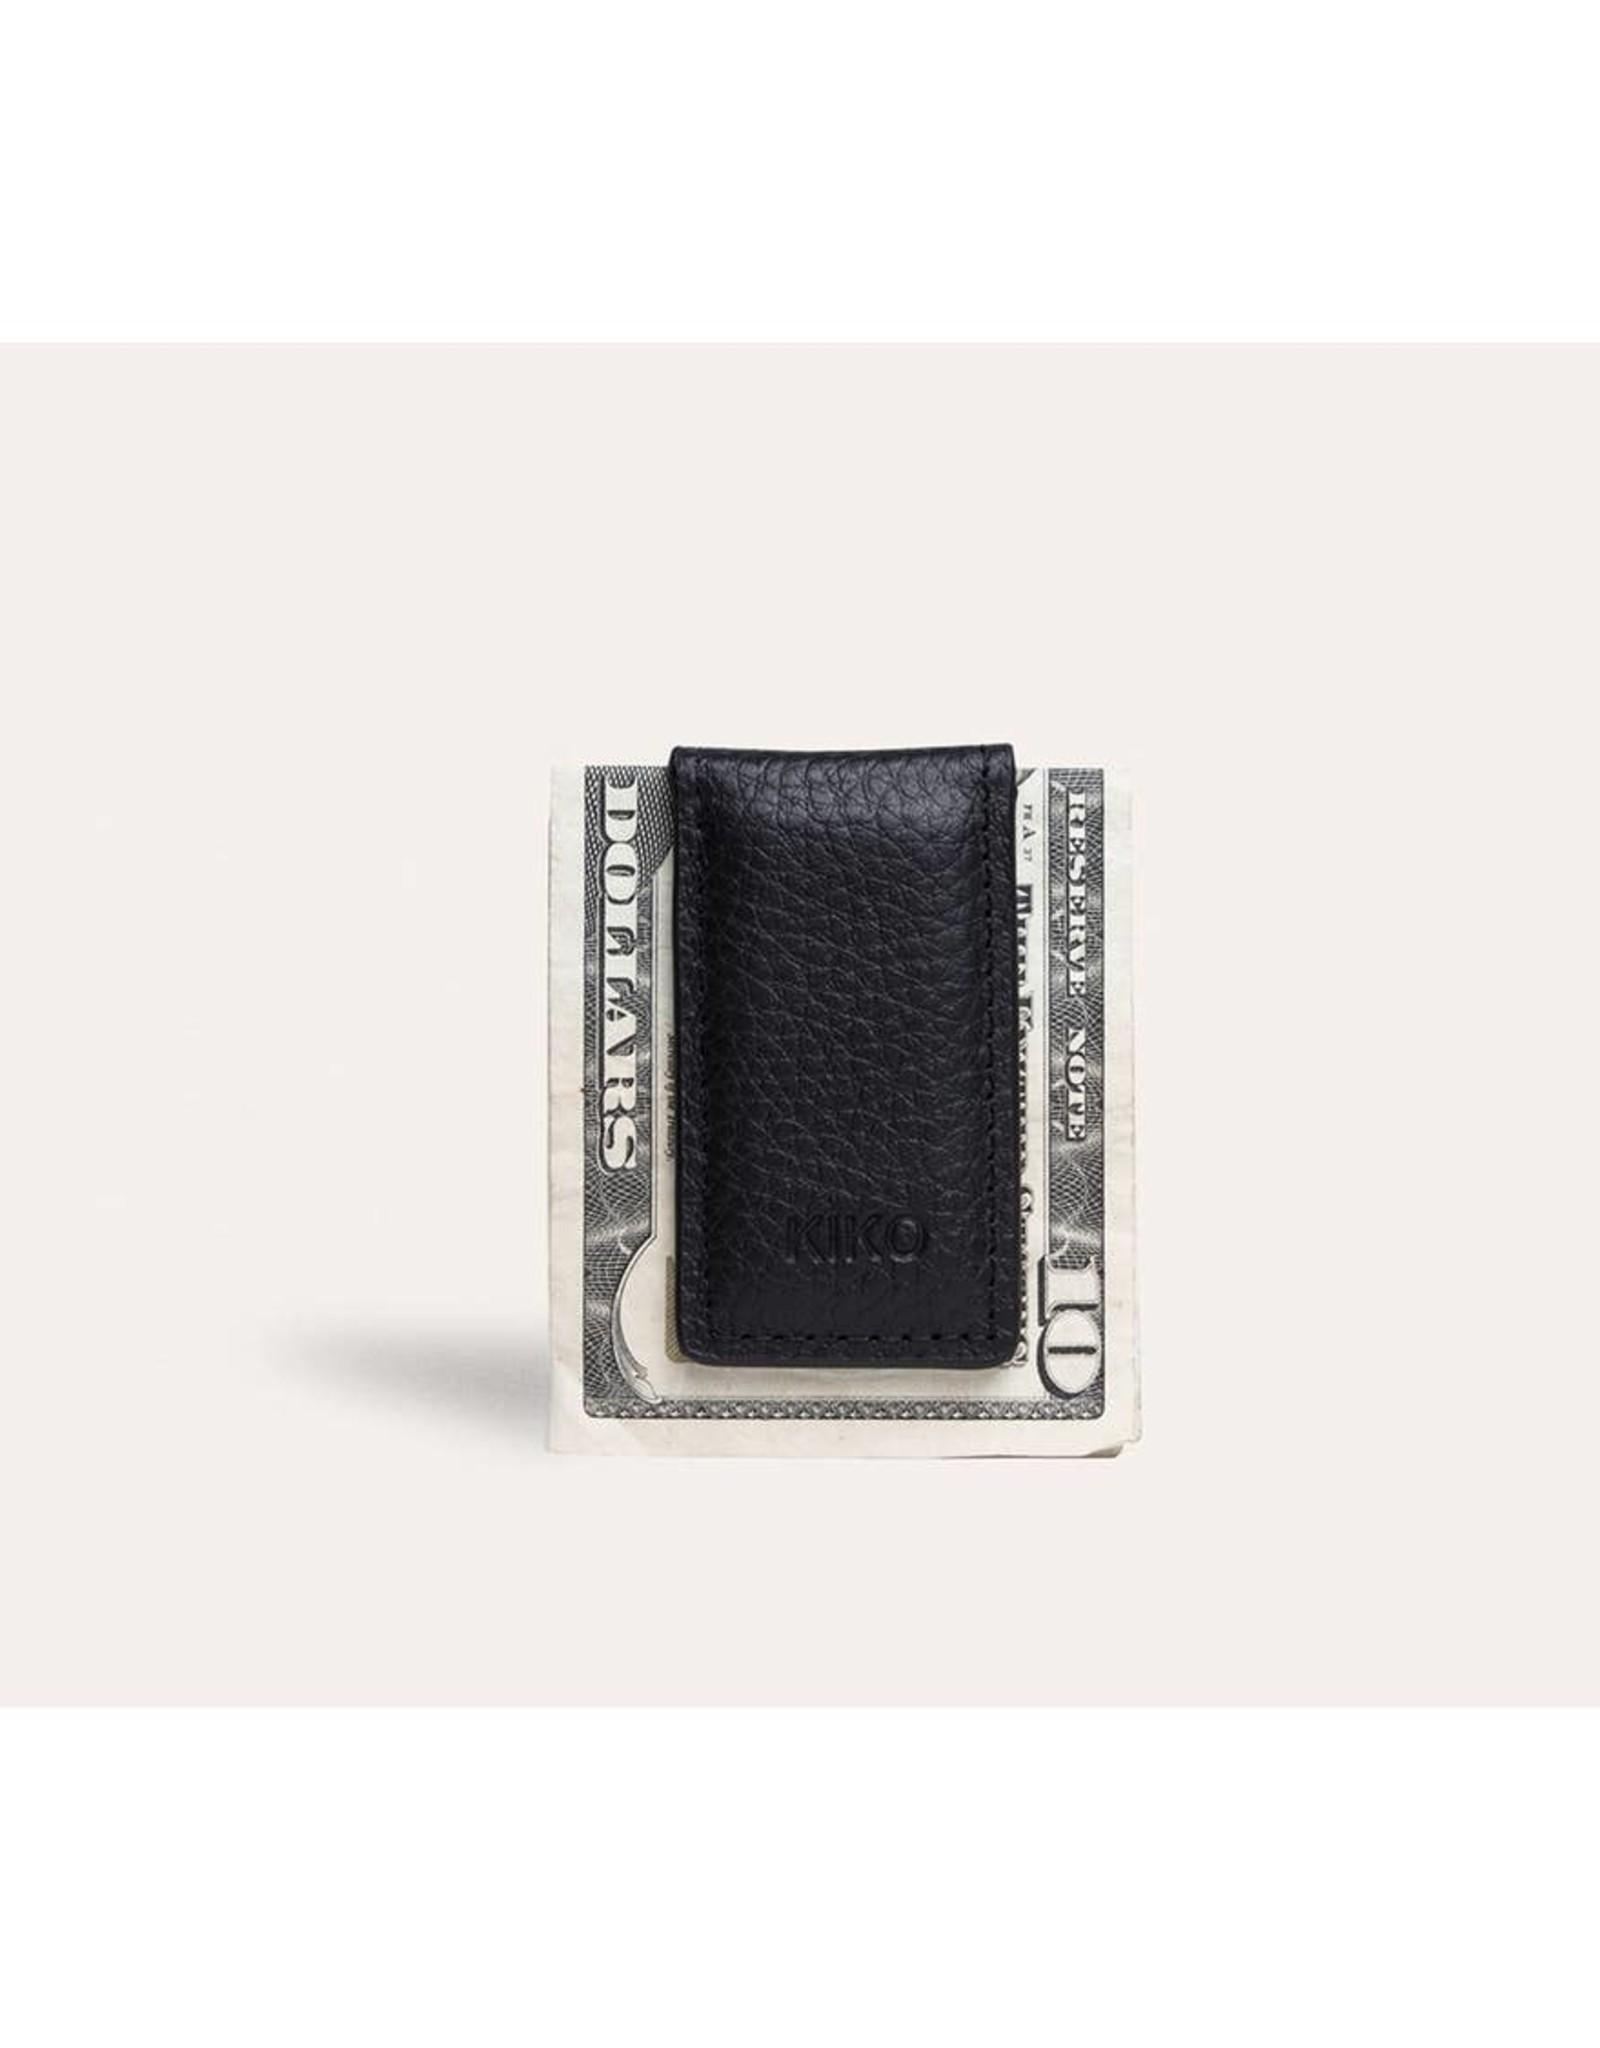 Kiko Leather Kiko Leather | Black Magnetic Money Clip